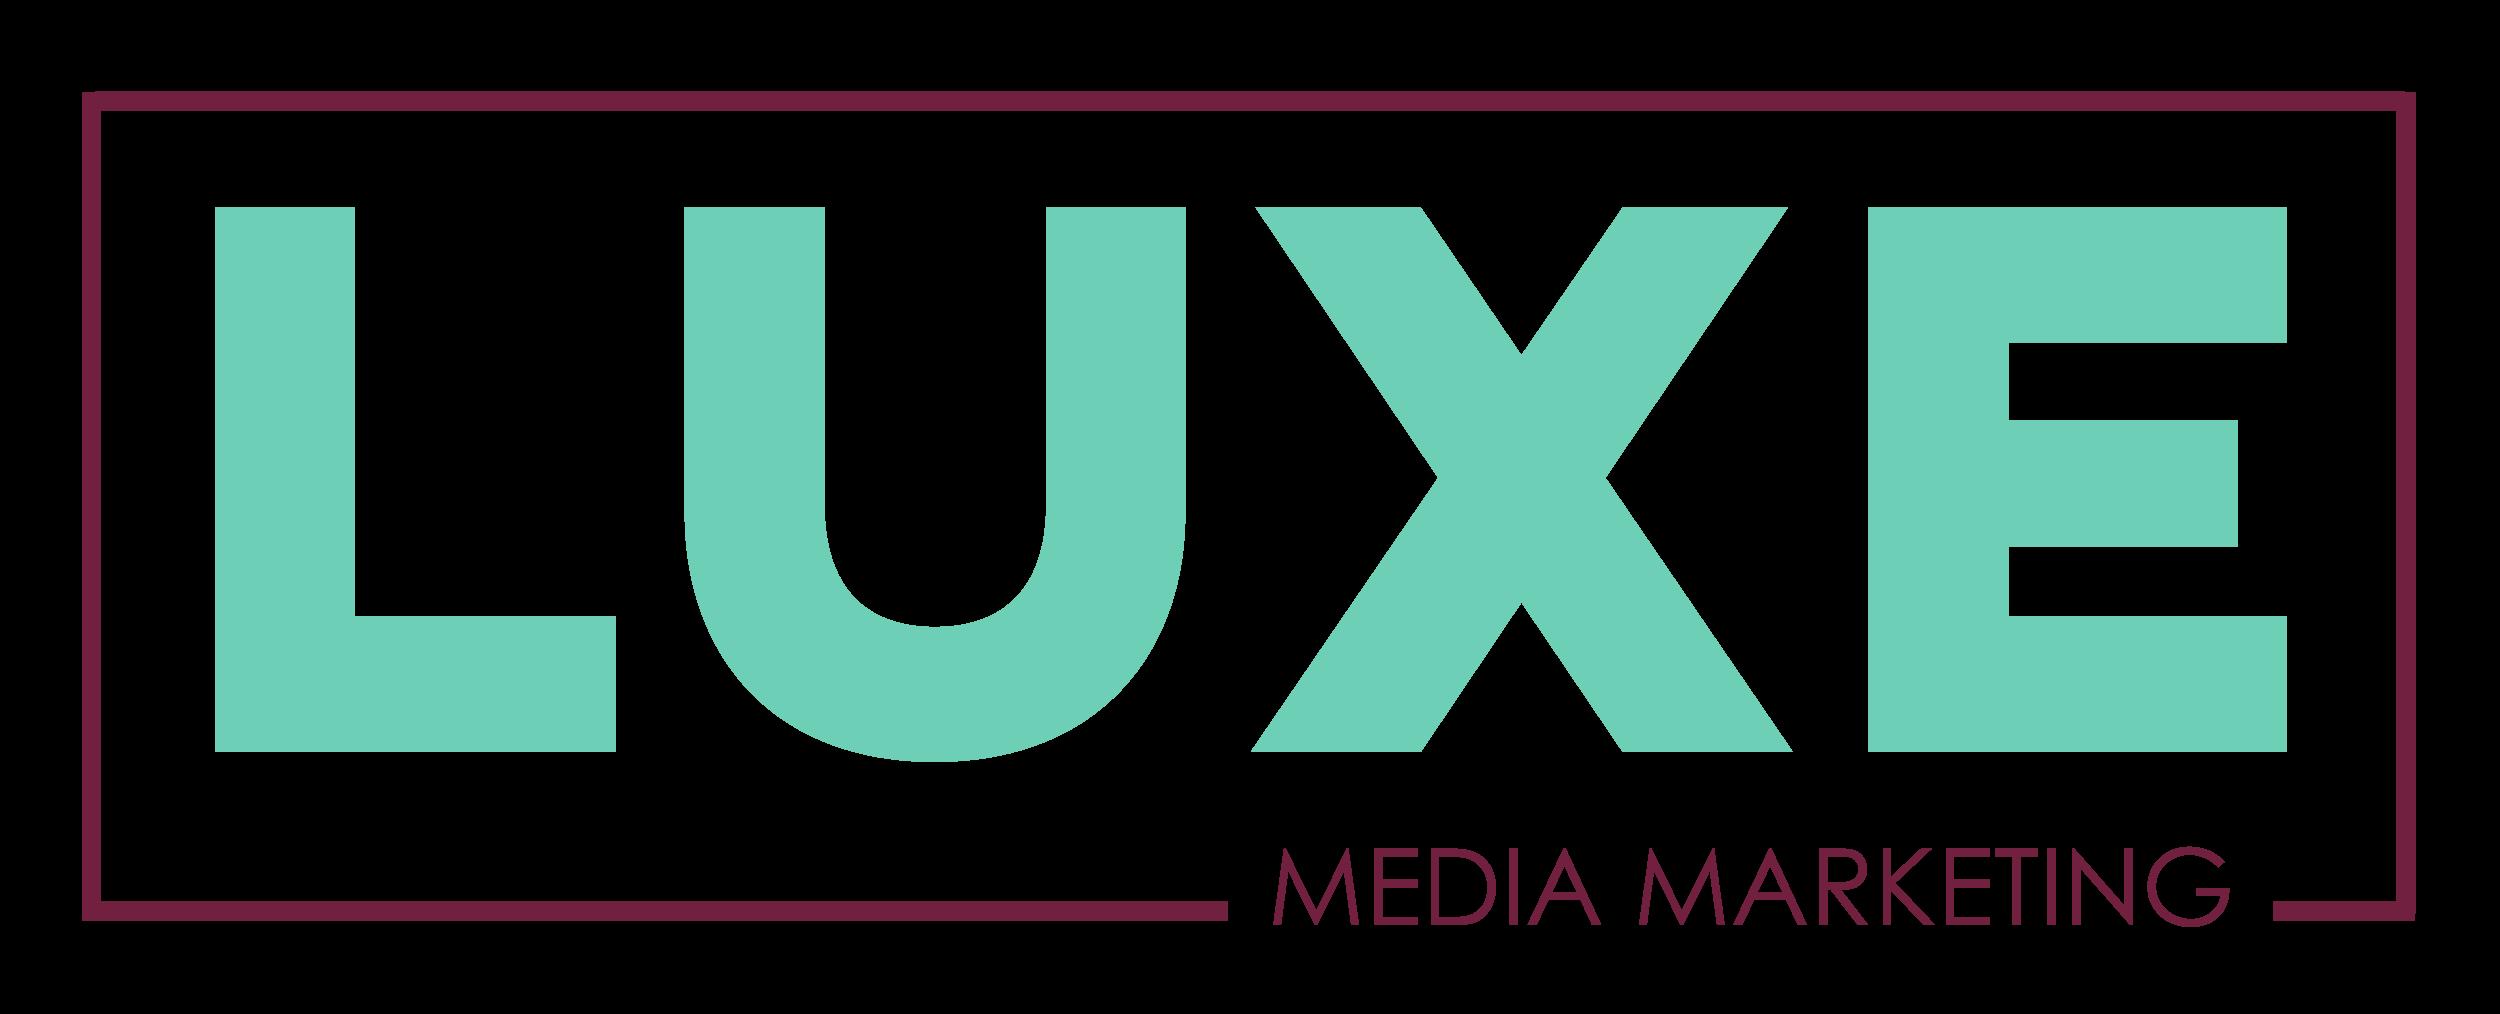 Luxe Media Marketing - Premier Marketing Agency in Cape Coral Florida